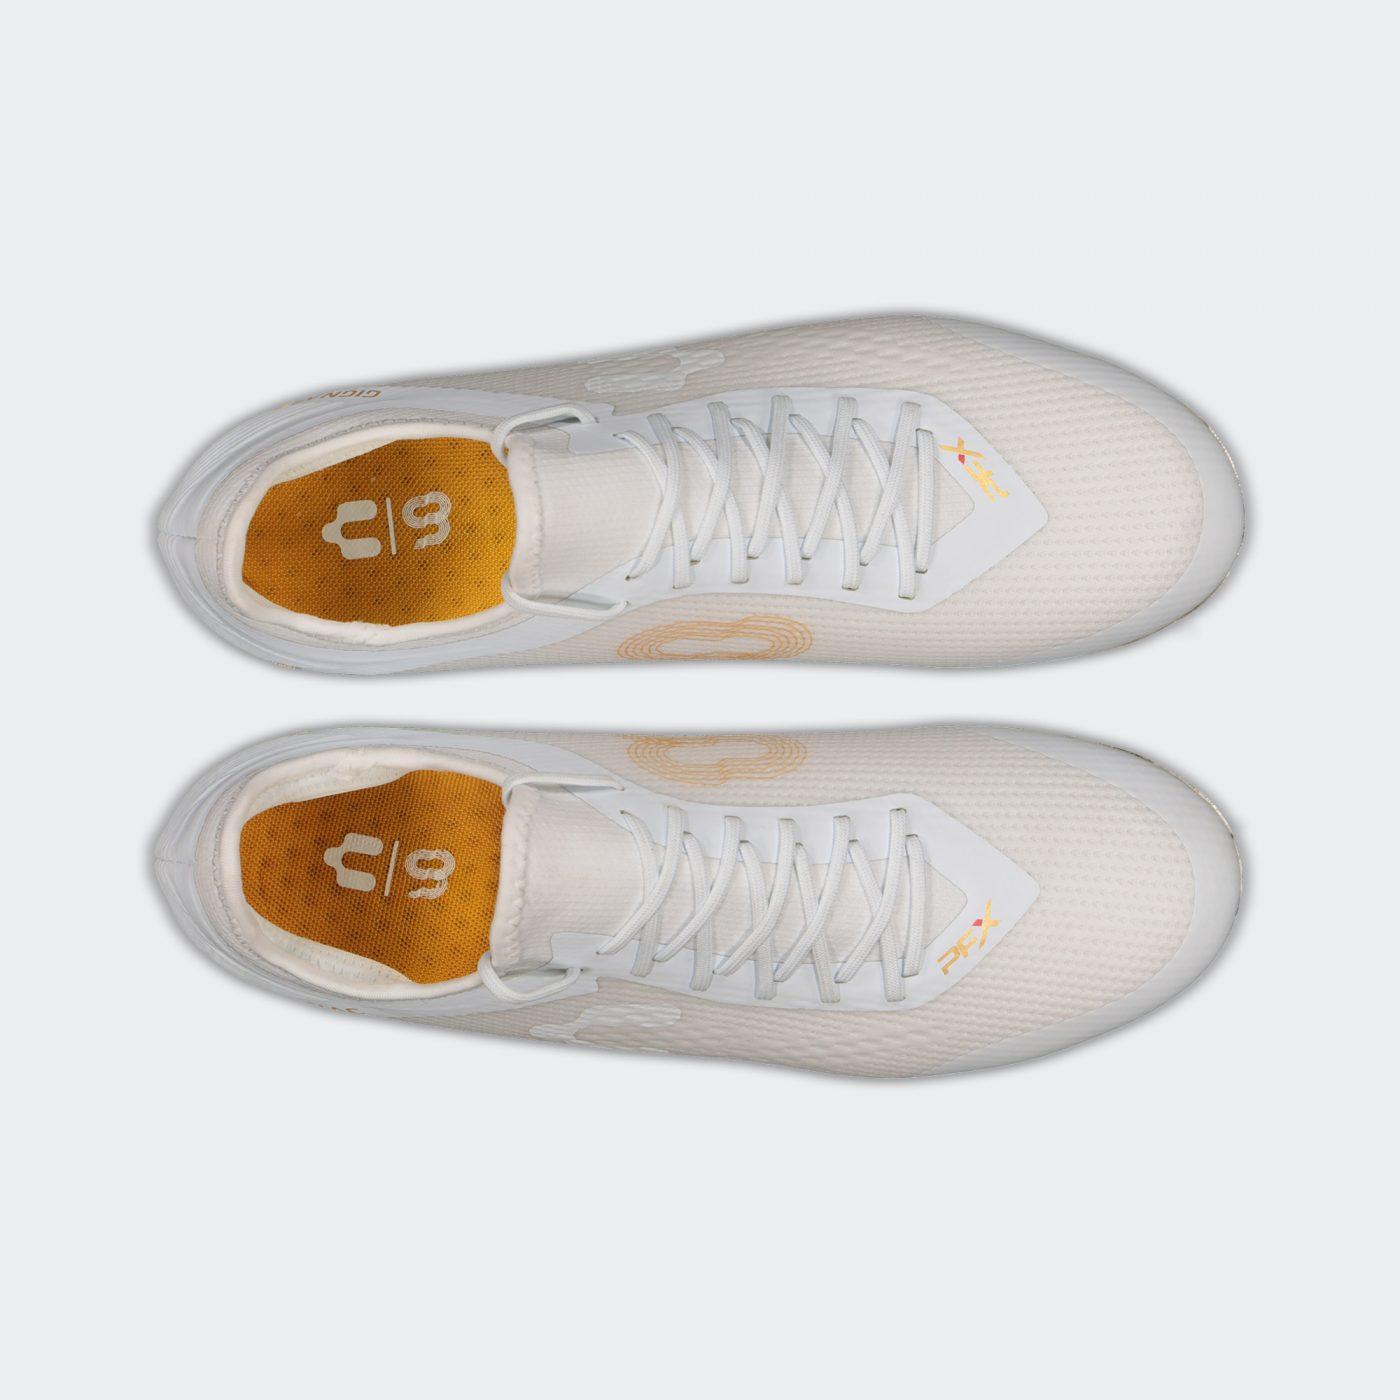 crampons-andre-pierrre-gignac-blanc-or-charly-futbol-5